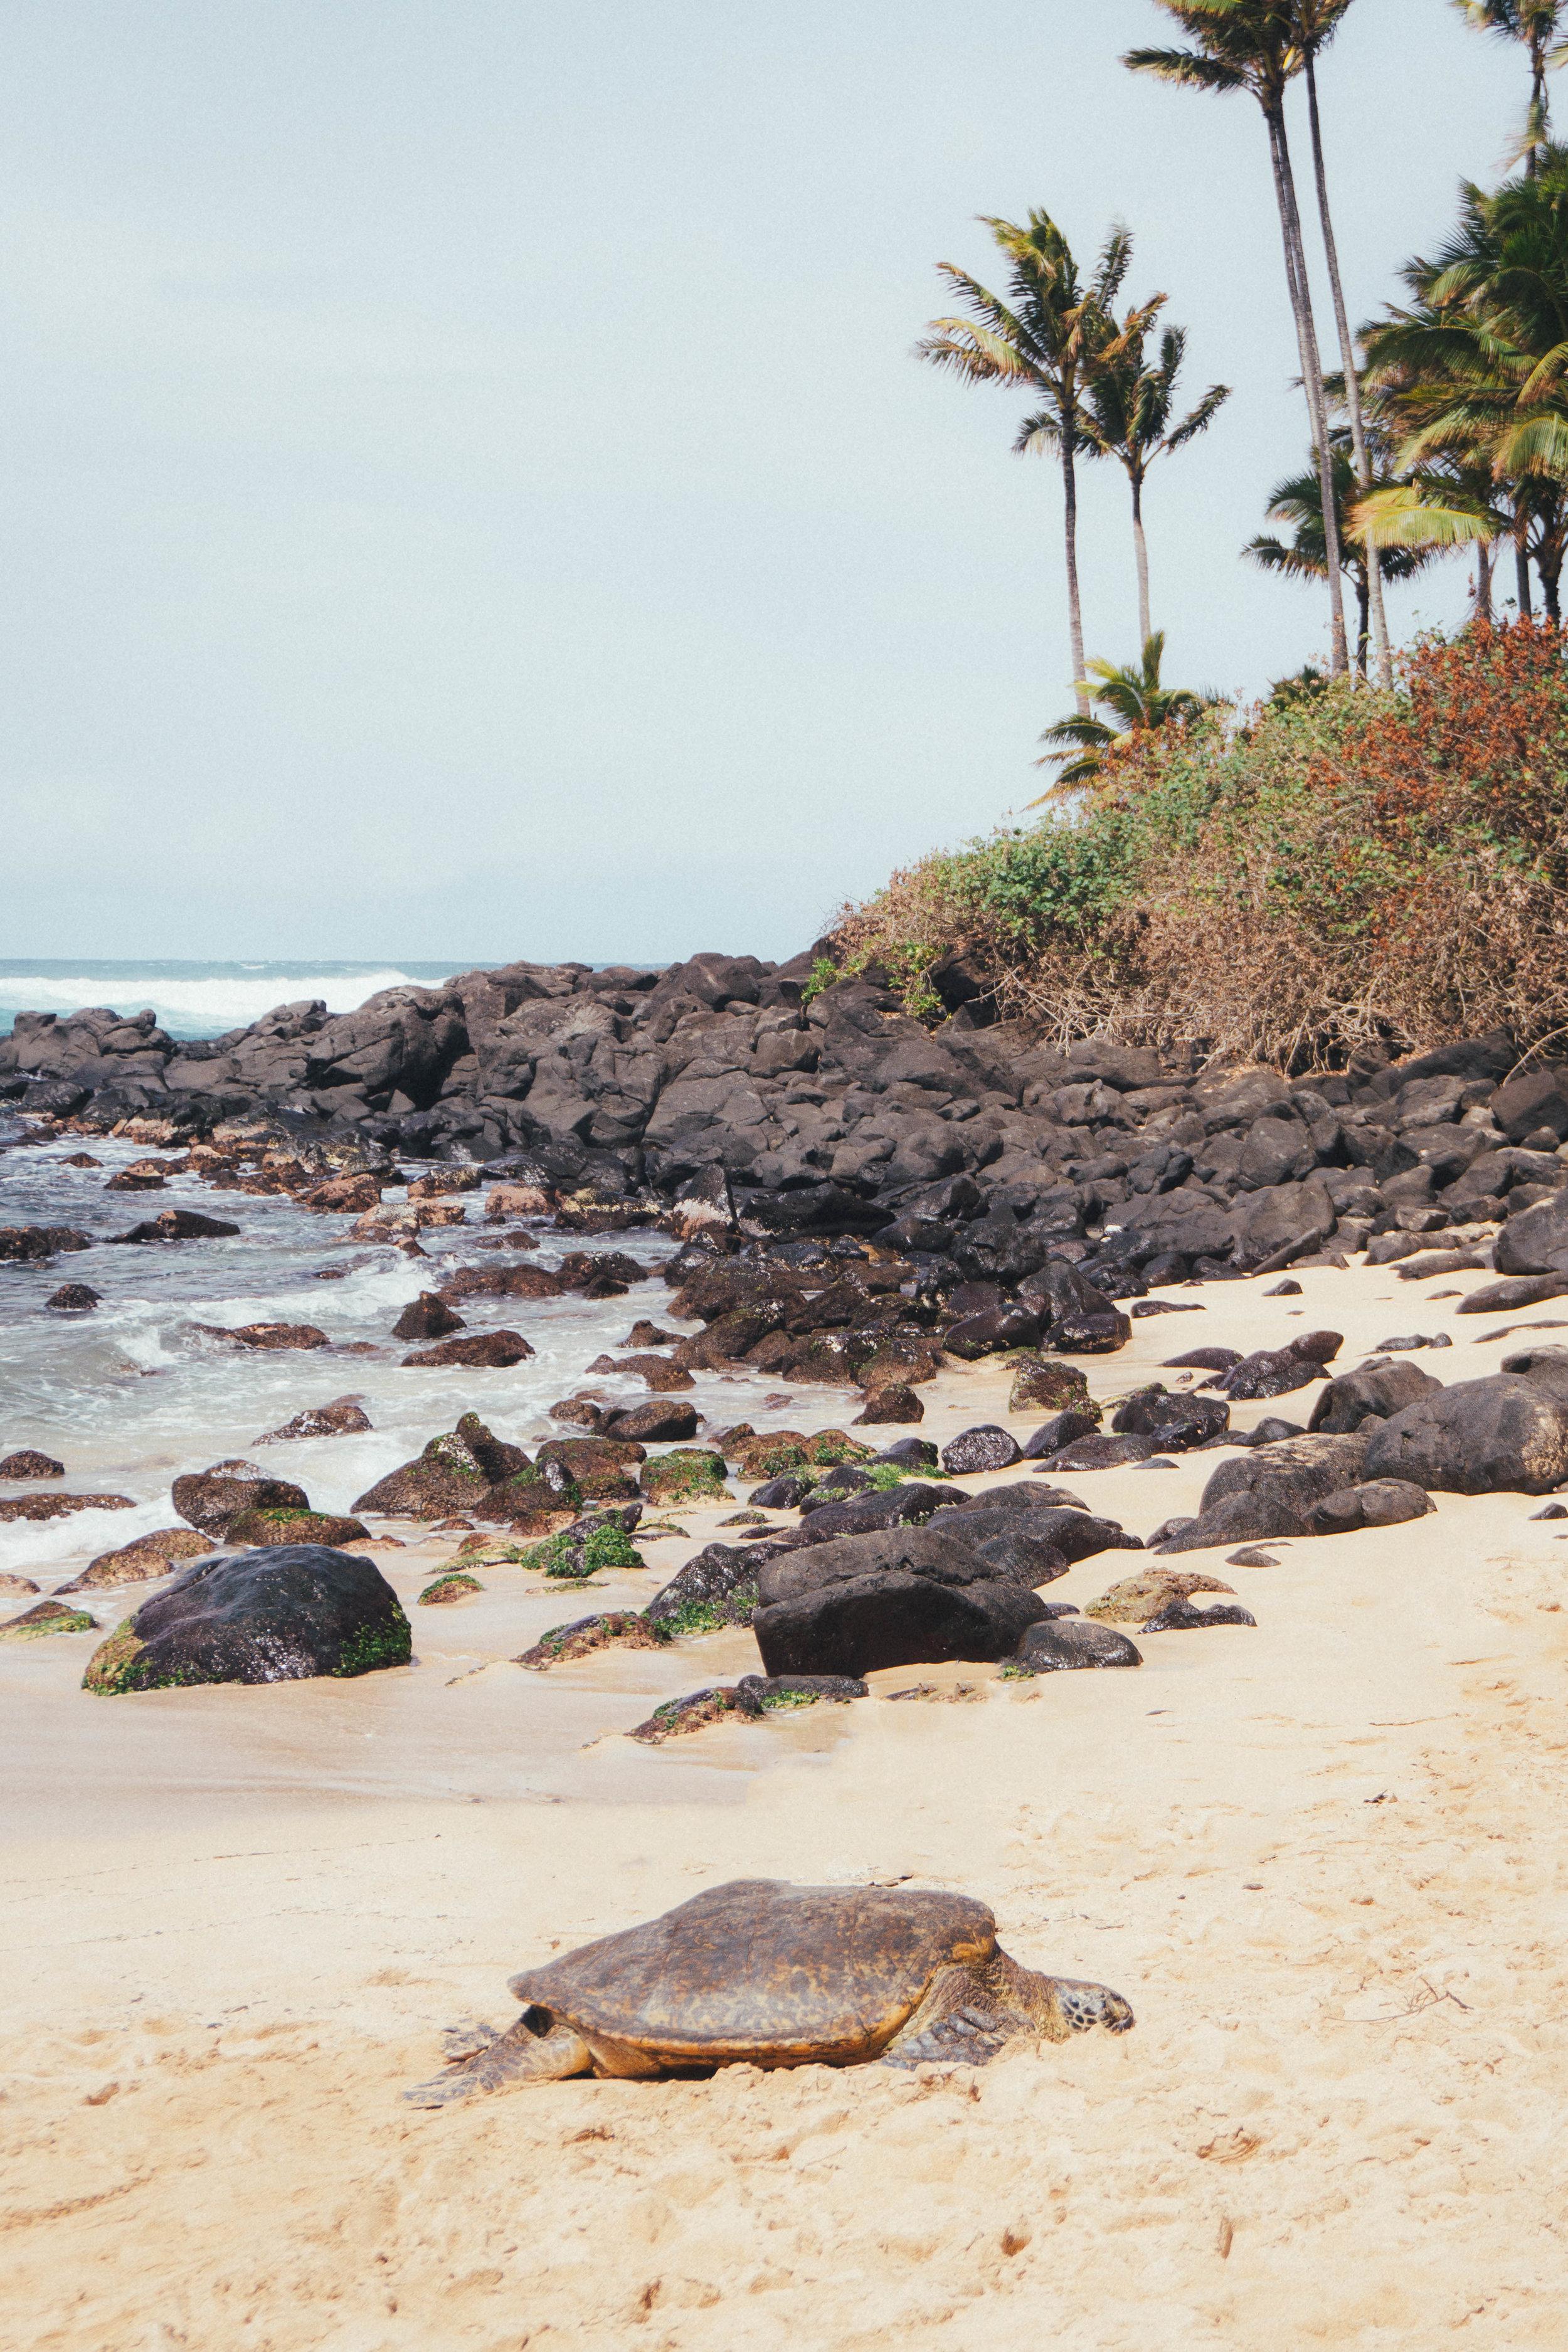 Erica_Luo_Best_Travel_Blogger_Oahu_Hawaii--5.jpg